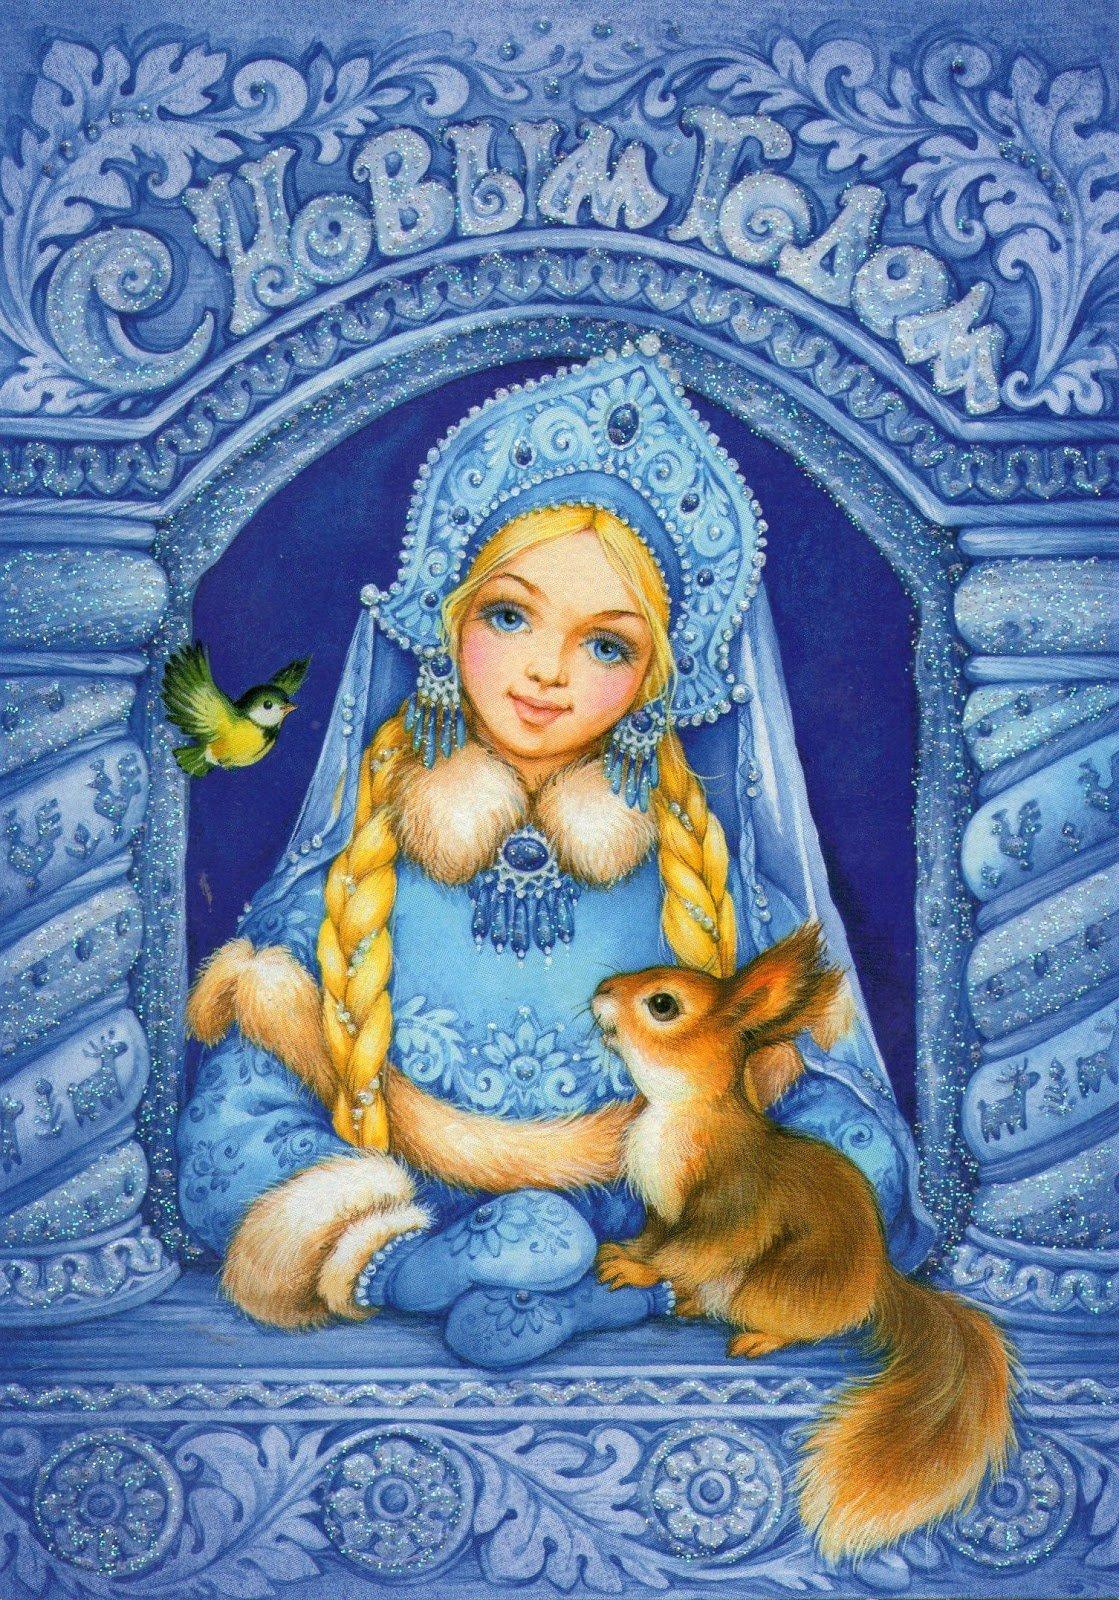 Маме, снегурочка на открытку